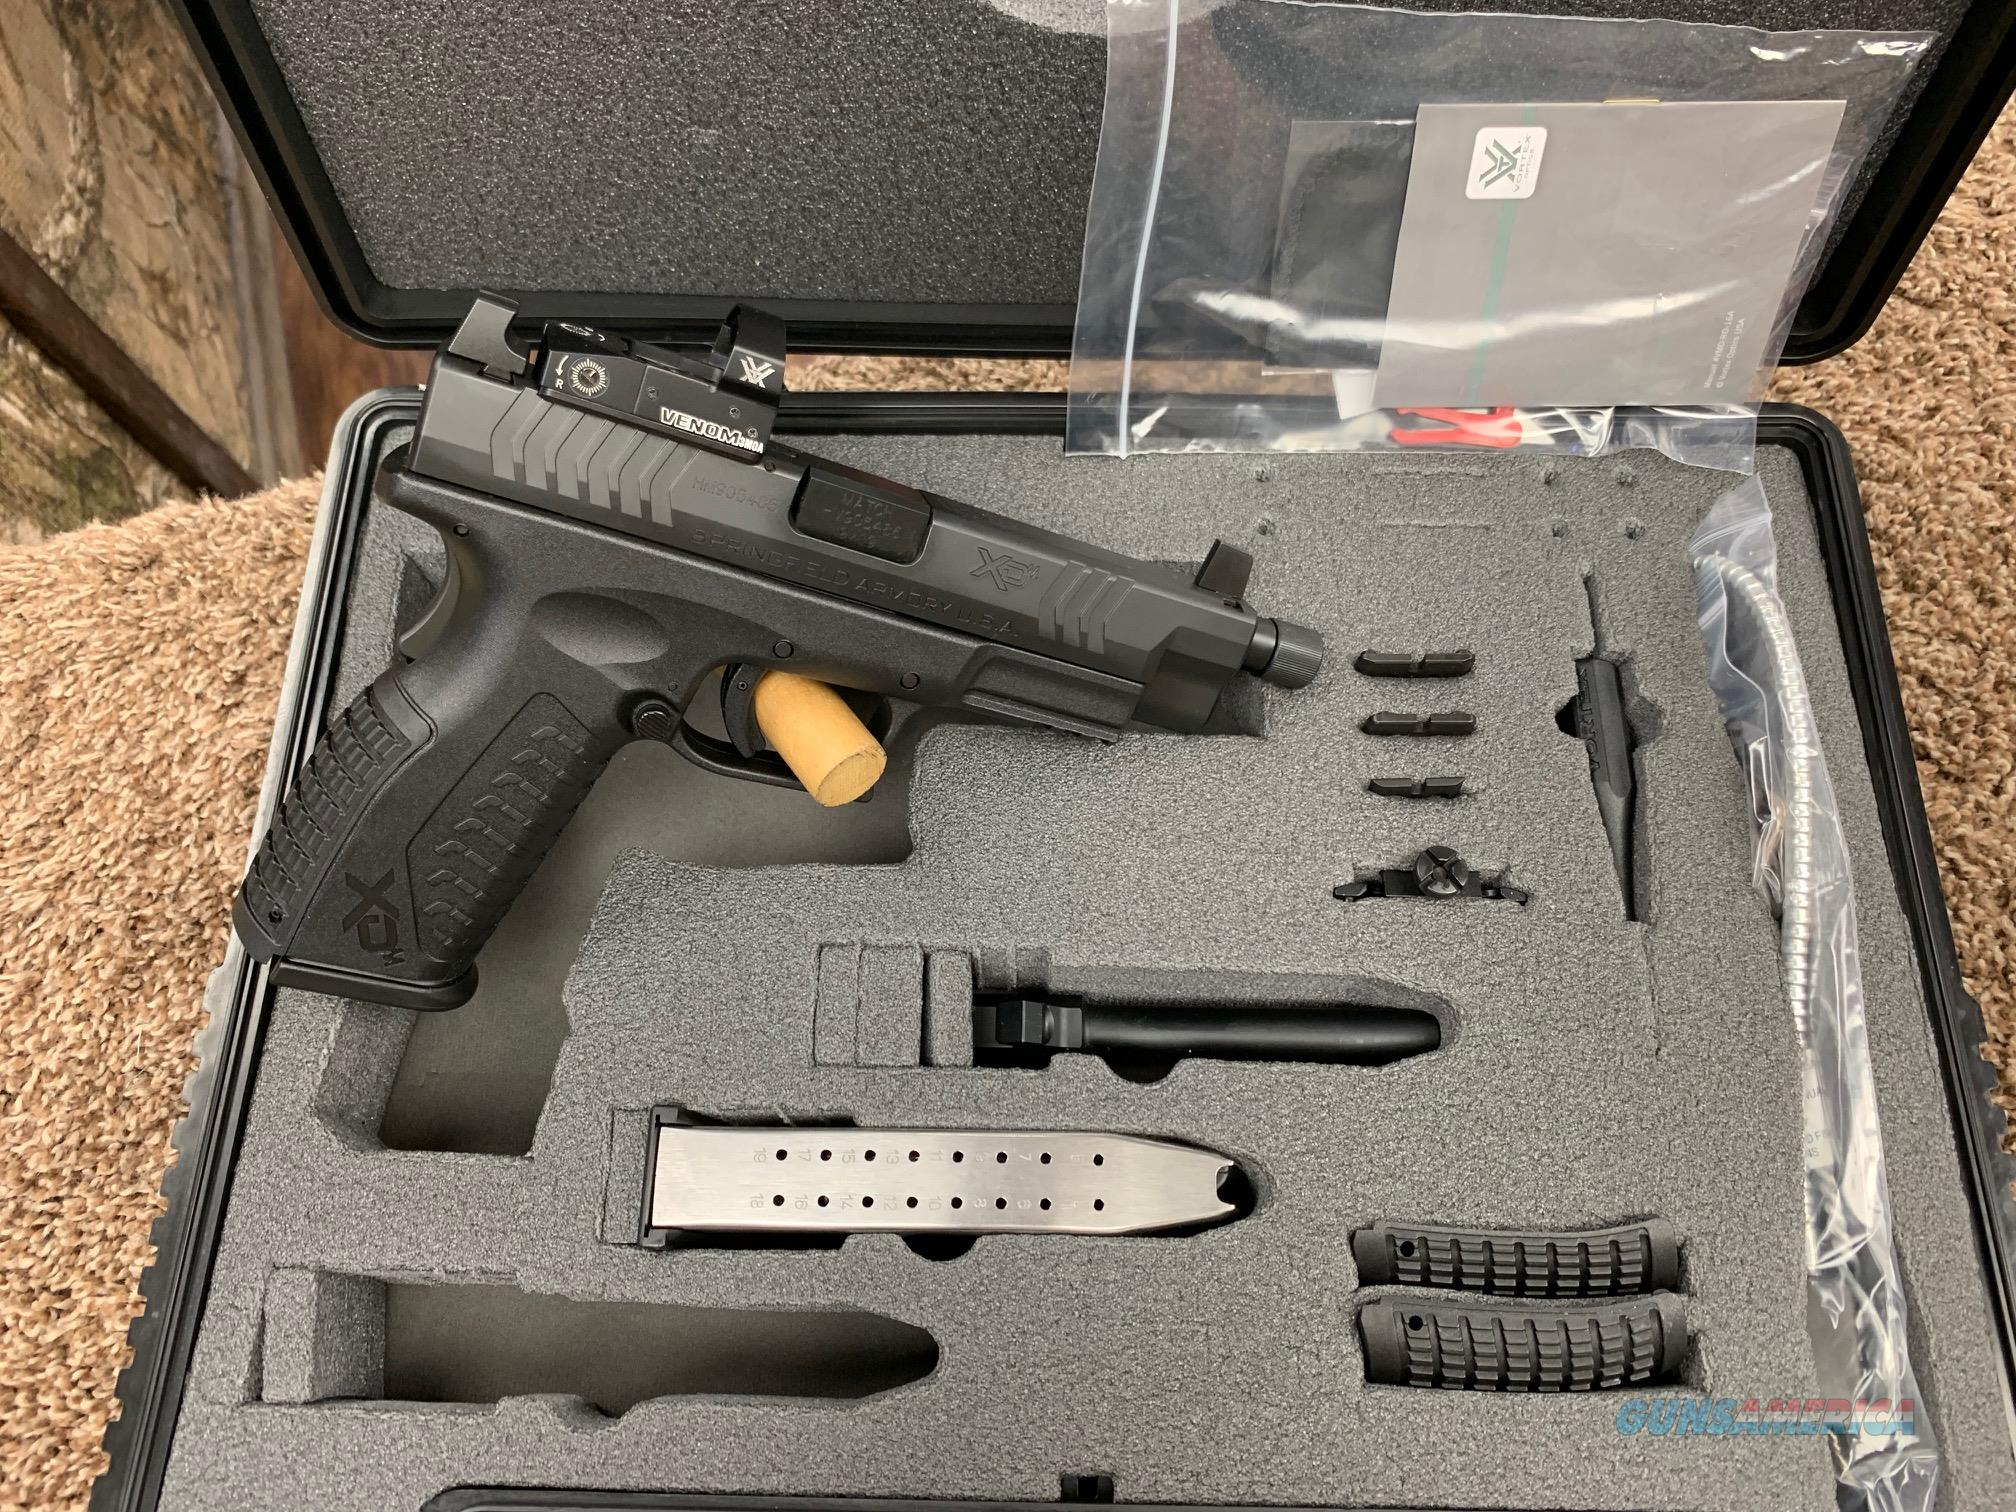 XDMT9459BHCOSPV Springfield XDM 2 barrel + Vortex optic combo 9mm  Guns > Pistols > Springfield Armory Pistols > XD-M